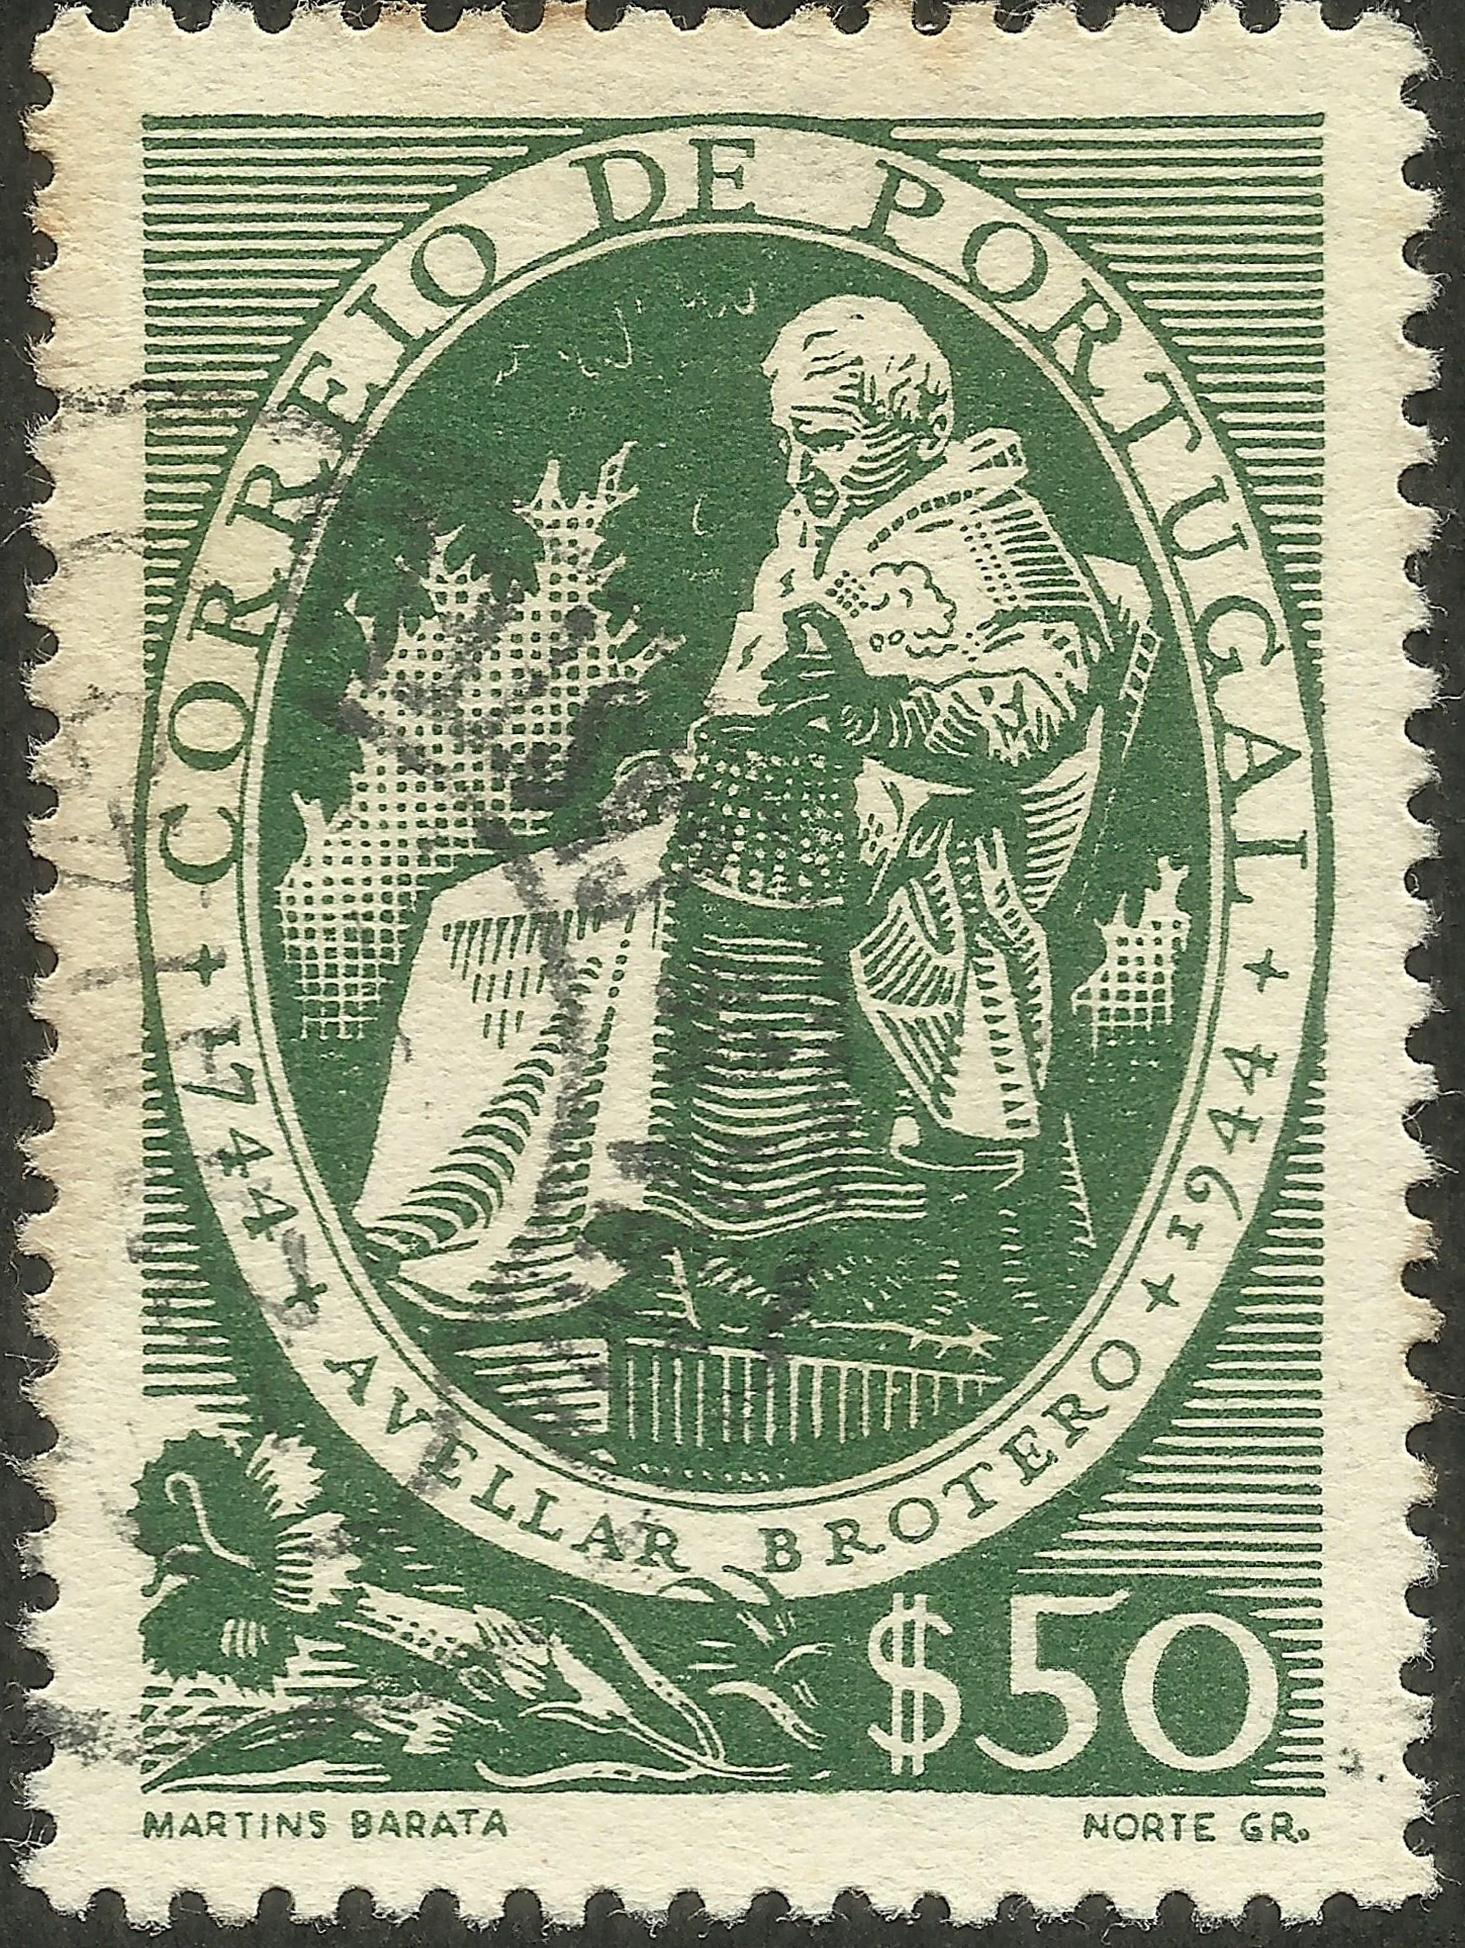 Portugal #639 (1944)